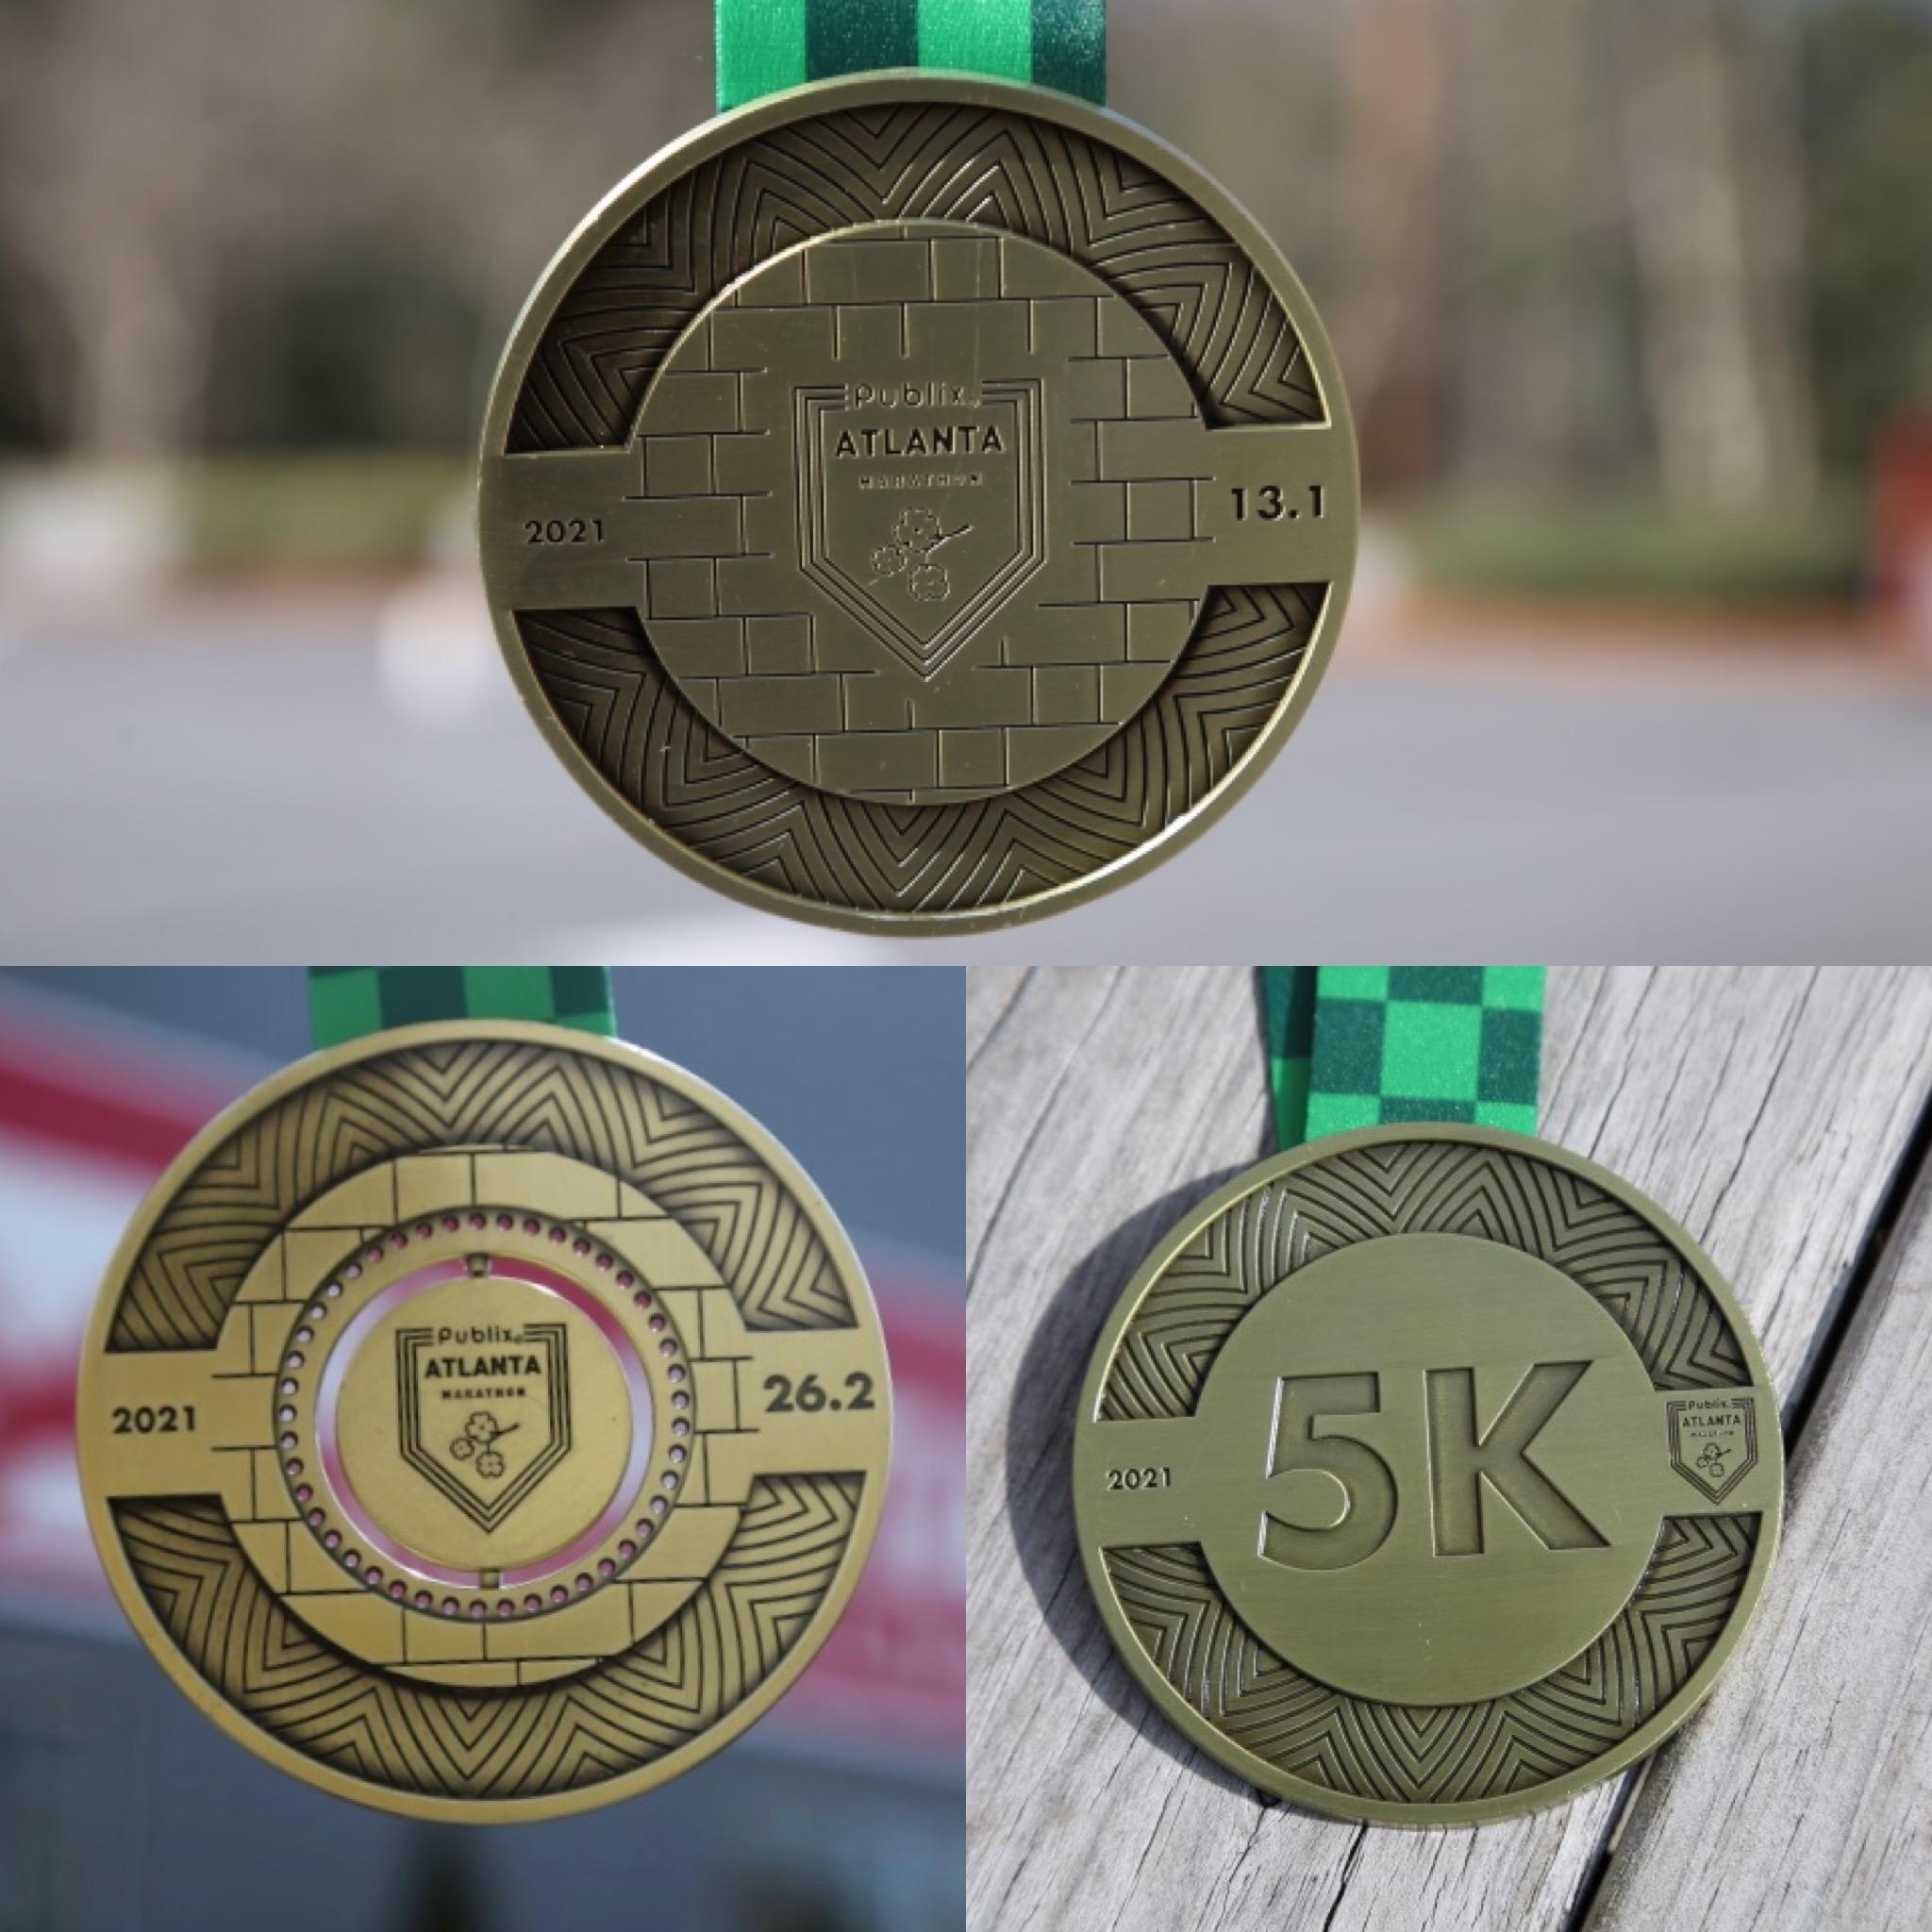 2021 Atlanta Medal